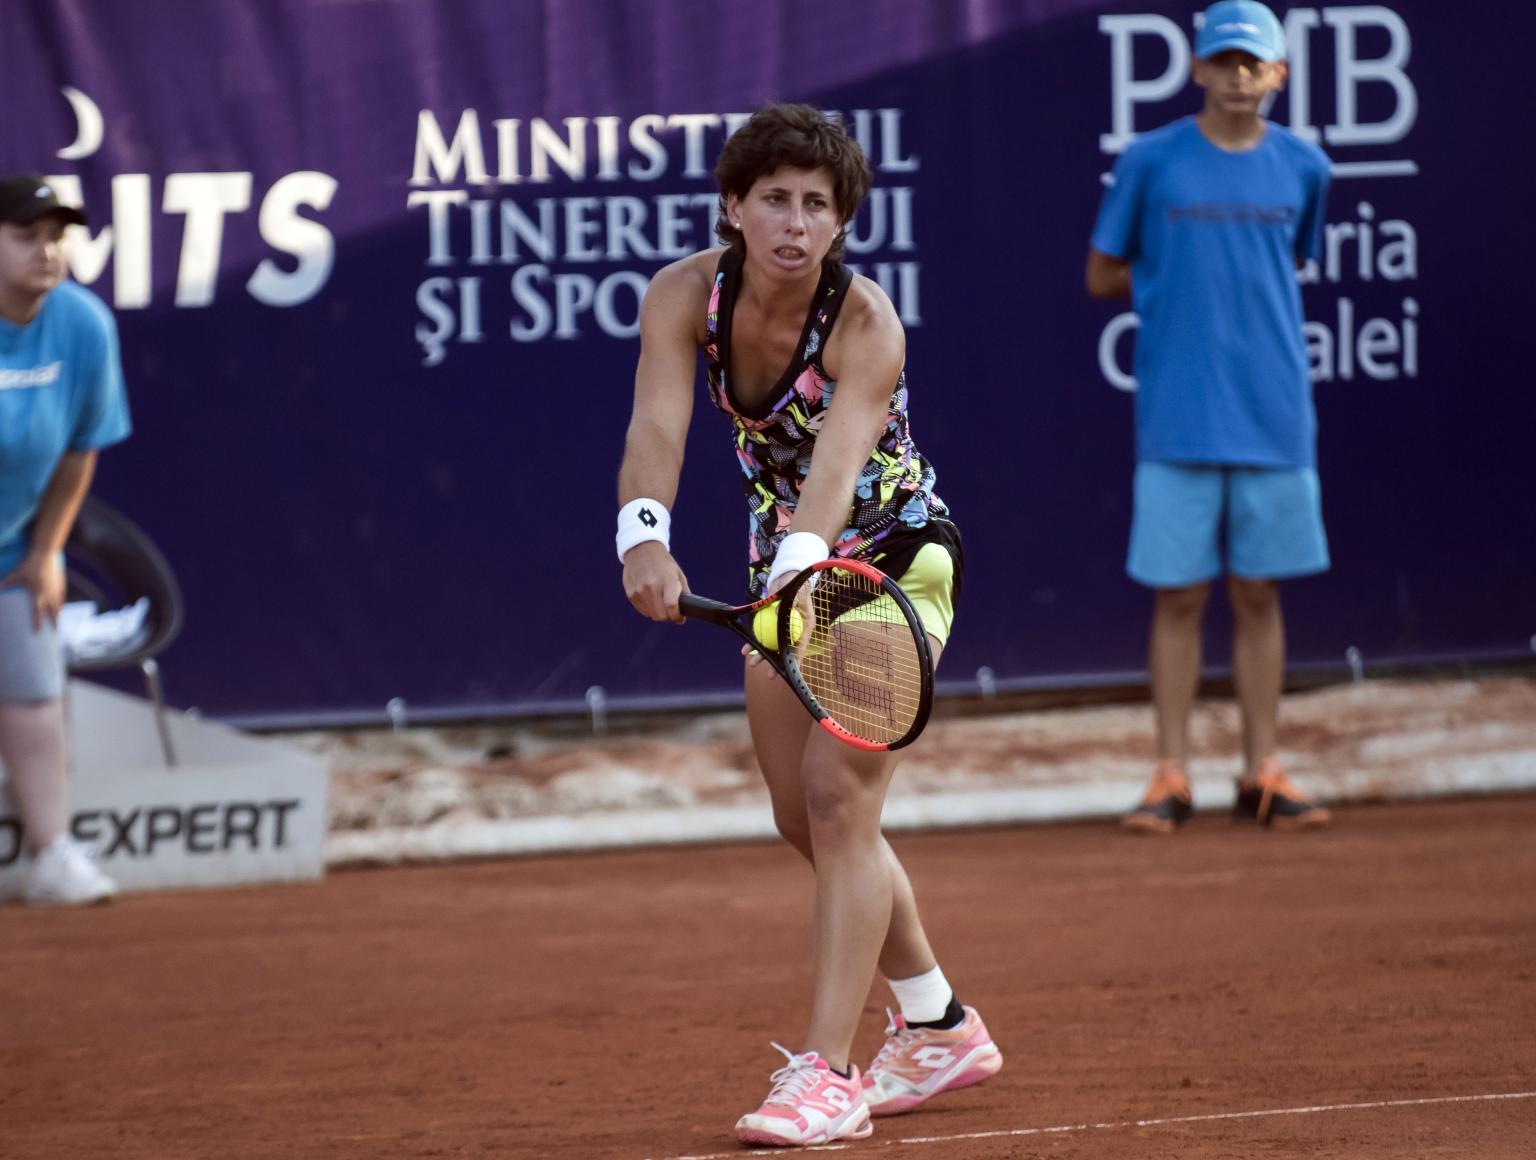 Ponturi Tenis Begu – Suarez Navarro – Bucuresti